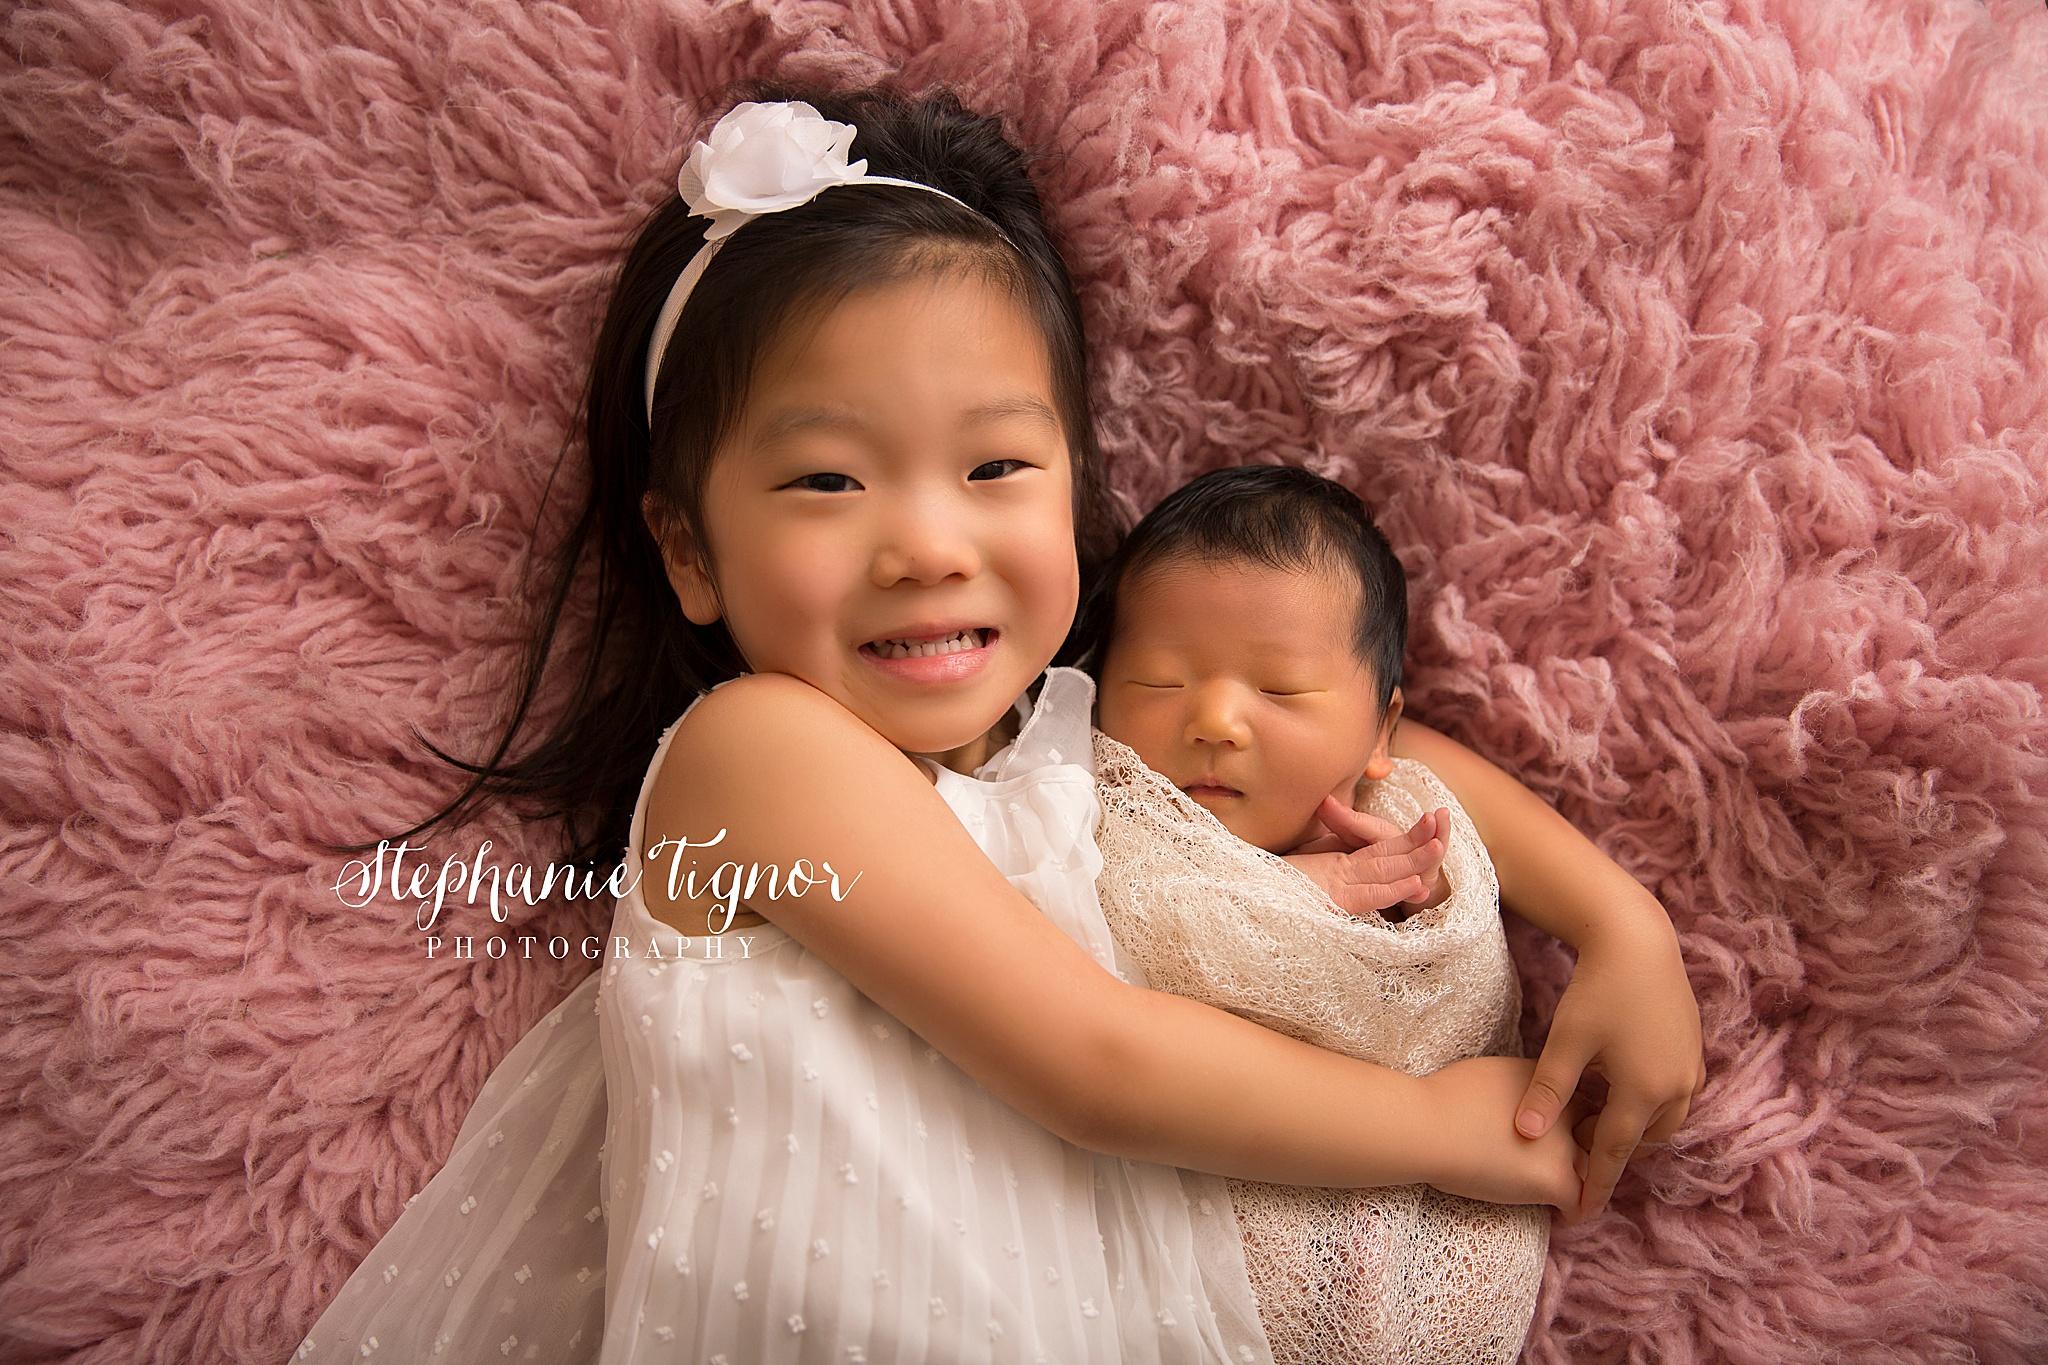 Stephanie Tignor Photography_Newborn Photographer_0078.jpg